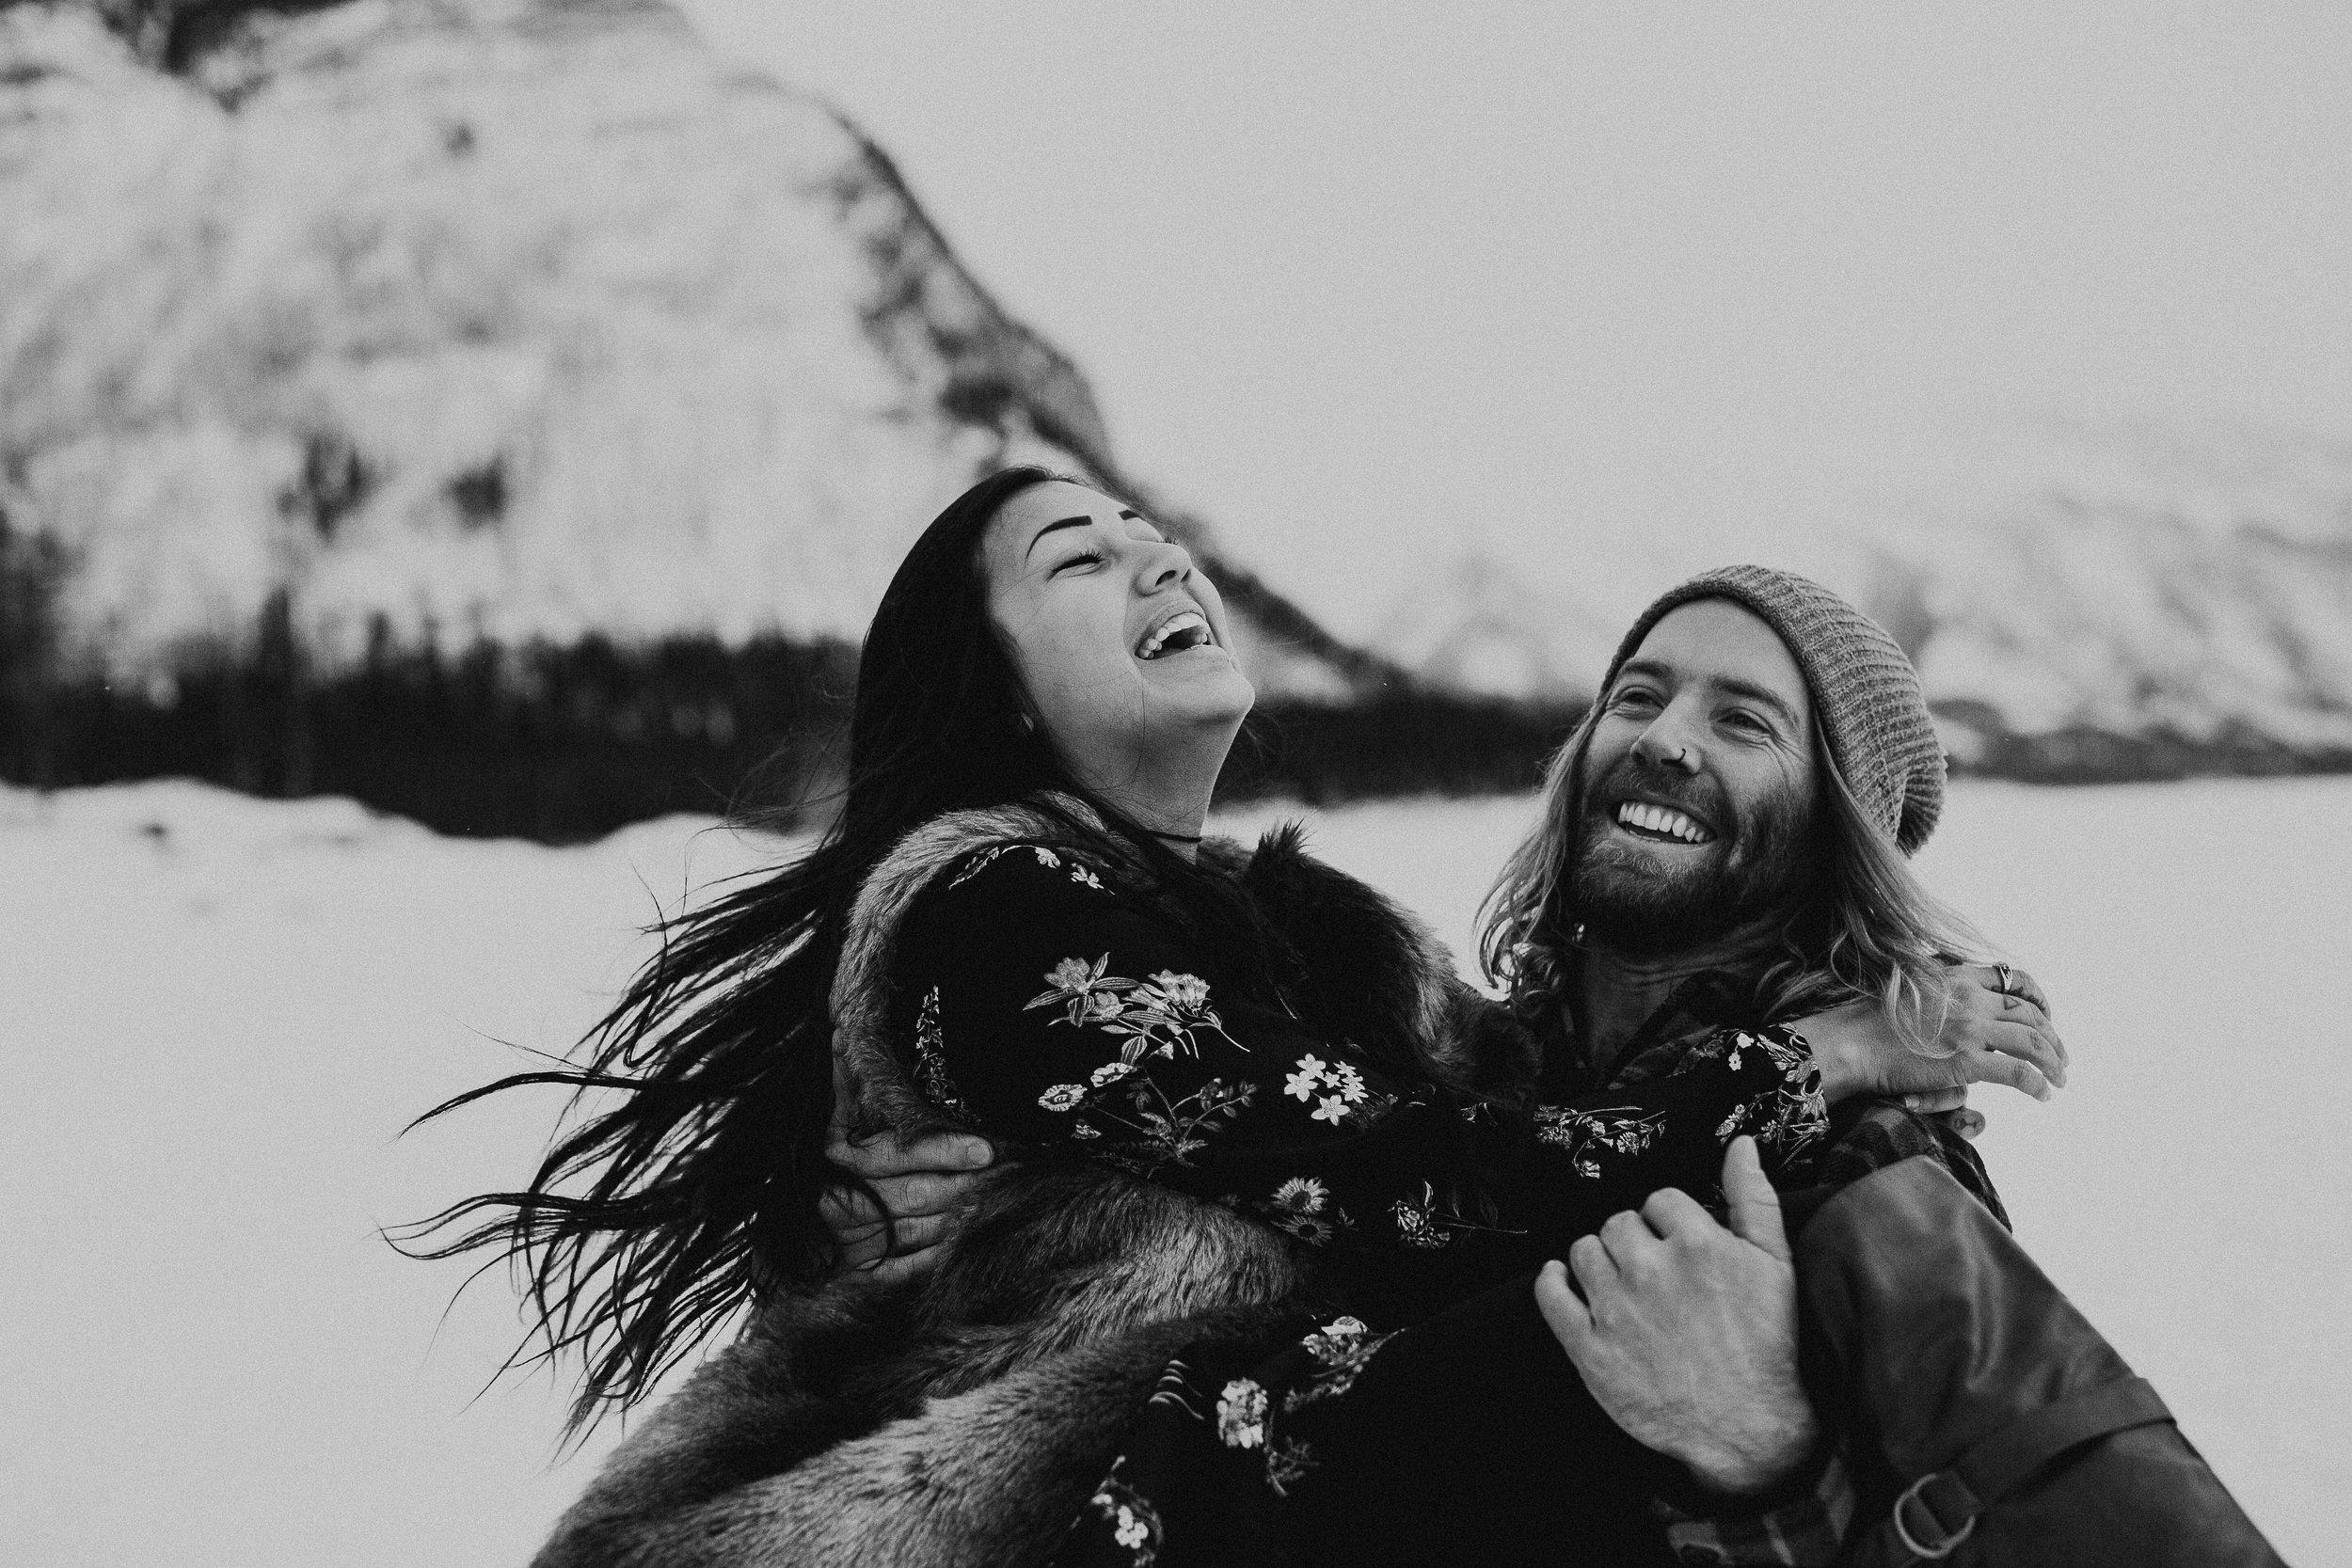 Banff Engagement Photographer - Winter Mountain Adventure Engagement Session - Michelle Larmand Photography-046